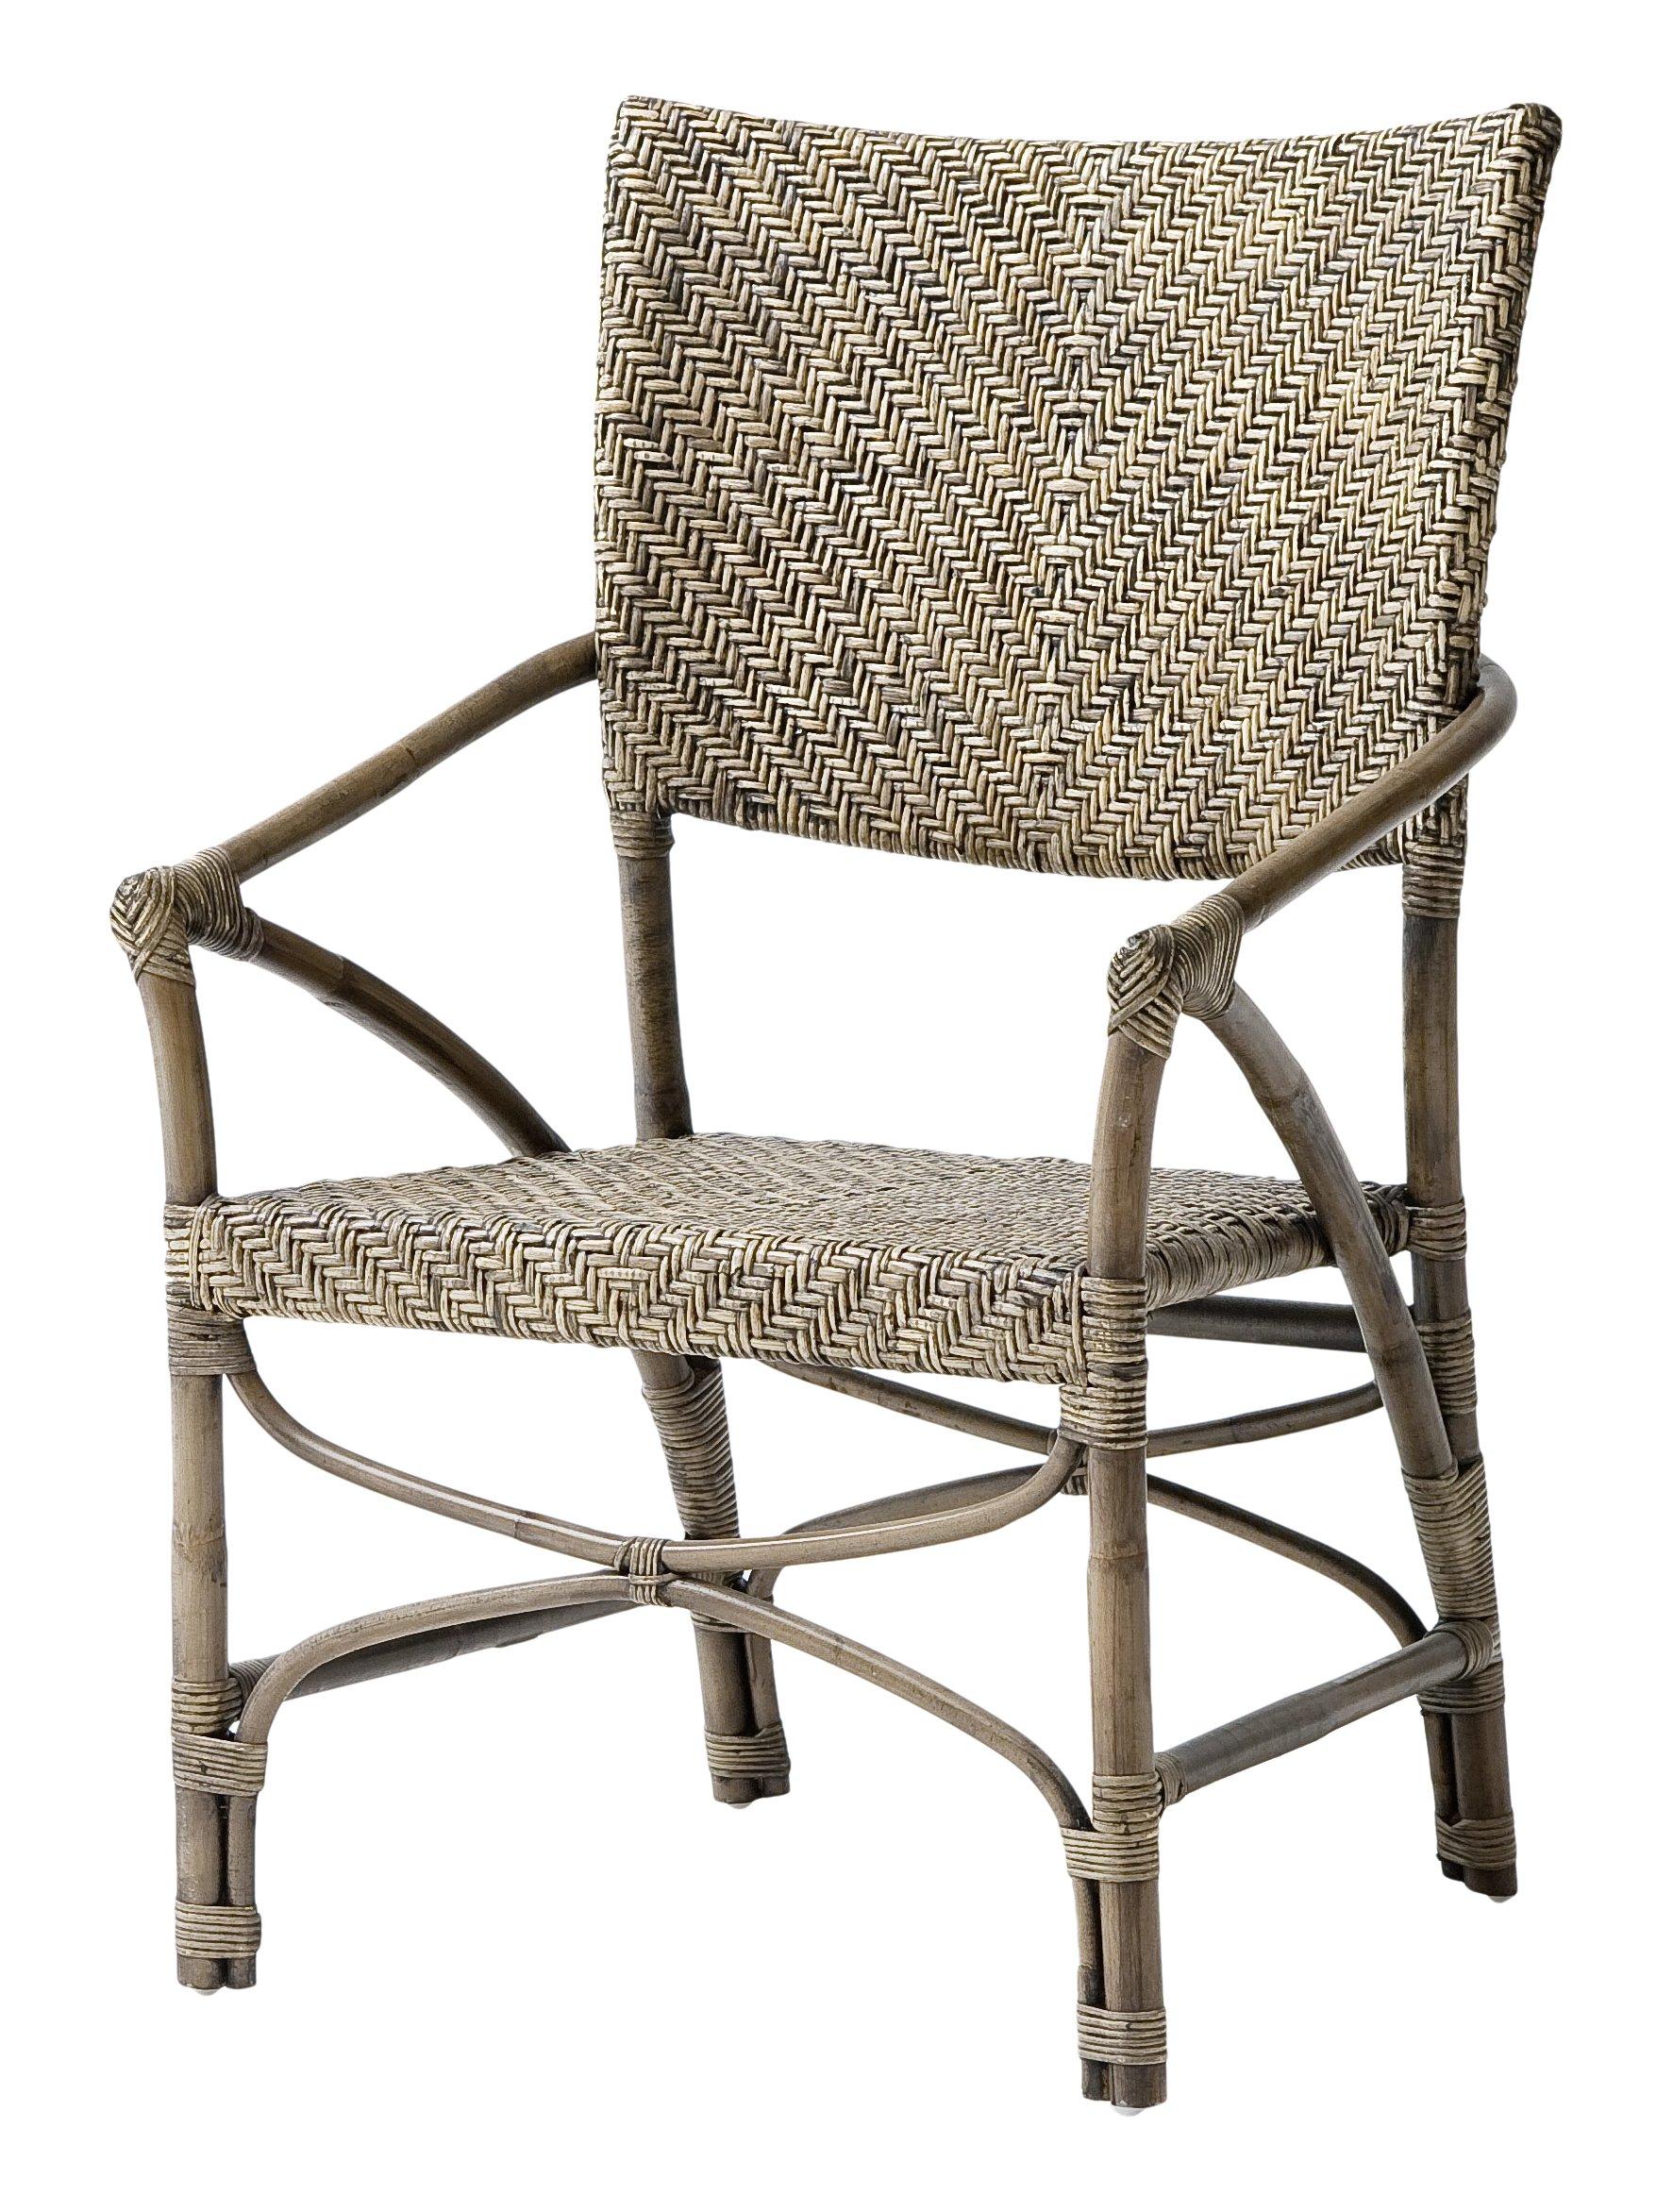 Nova Solo Jester Chair (Set of 2), Single, Natural Rustic